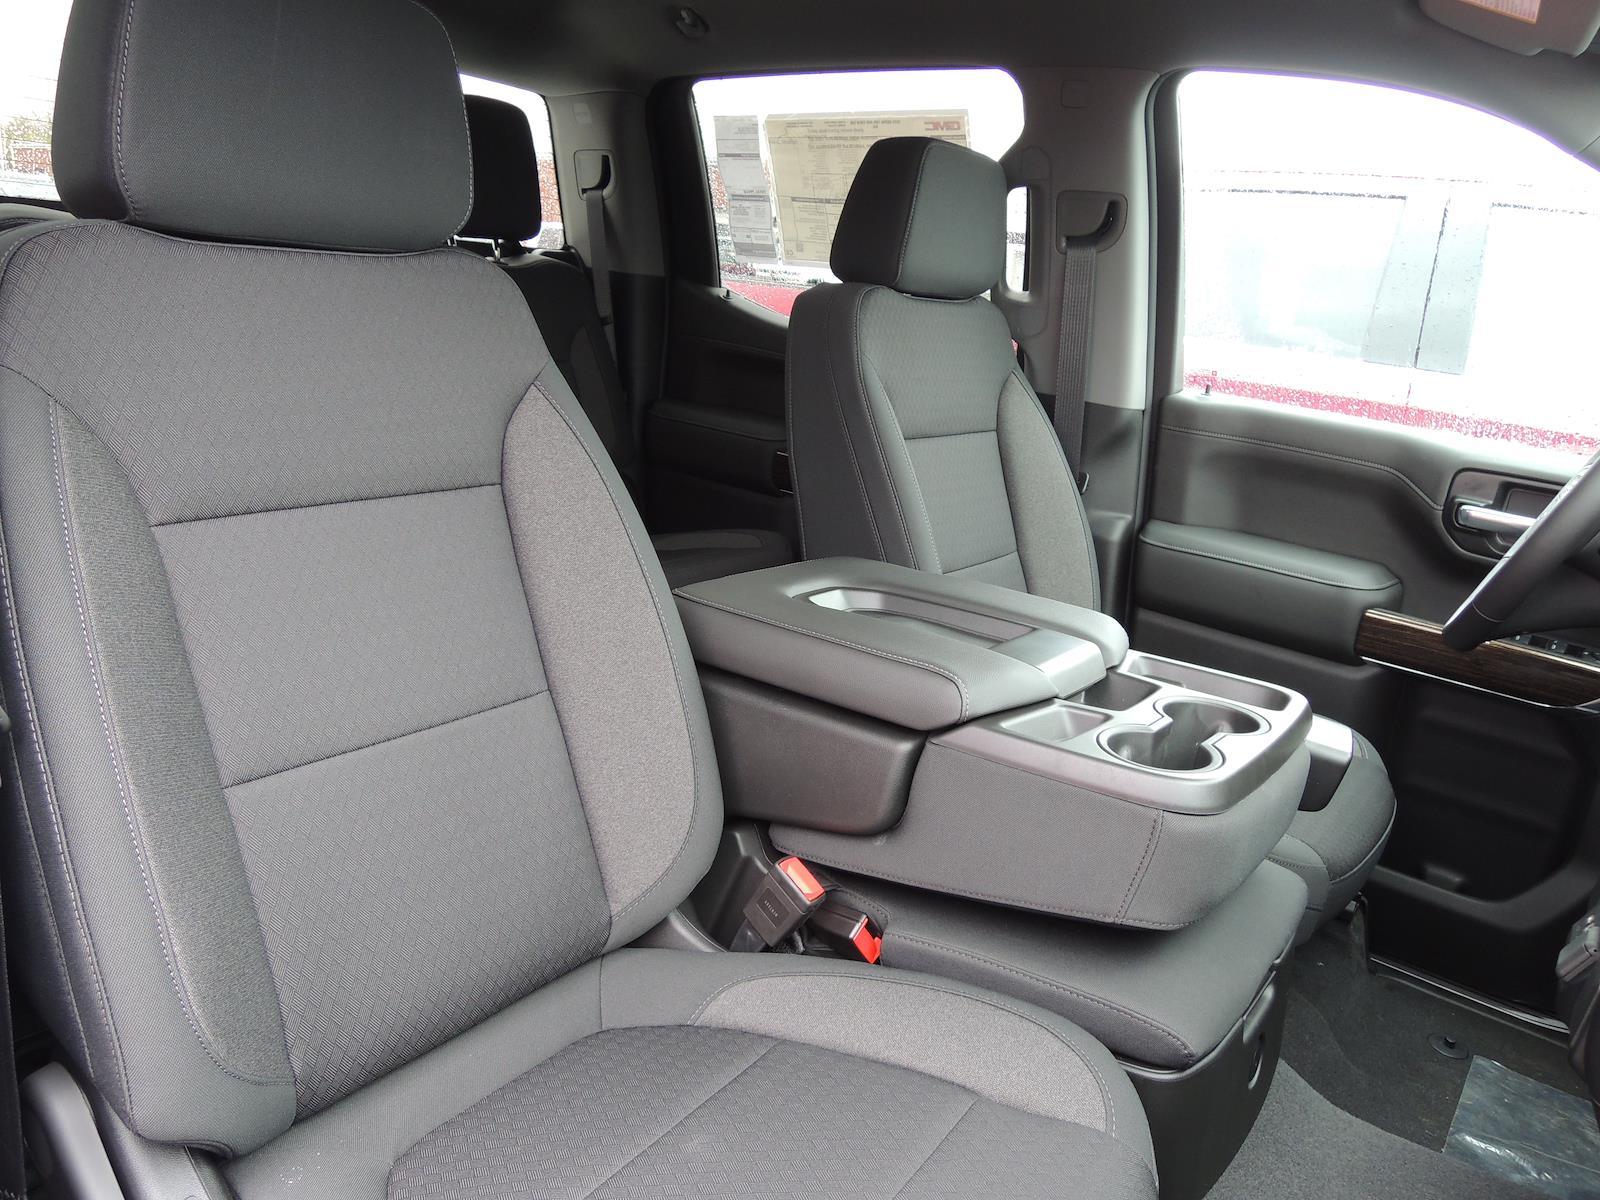 2021 GMC Sierra 1500 Crew Cab 4x4, Pickup #MT636 - photo 6